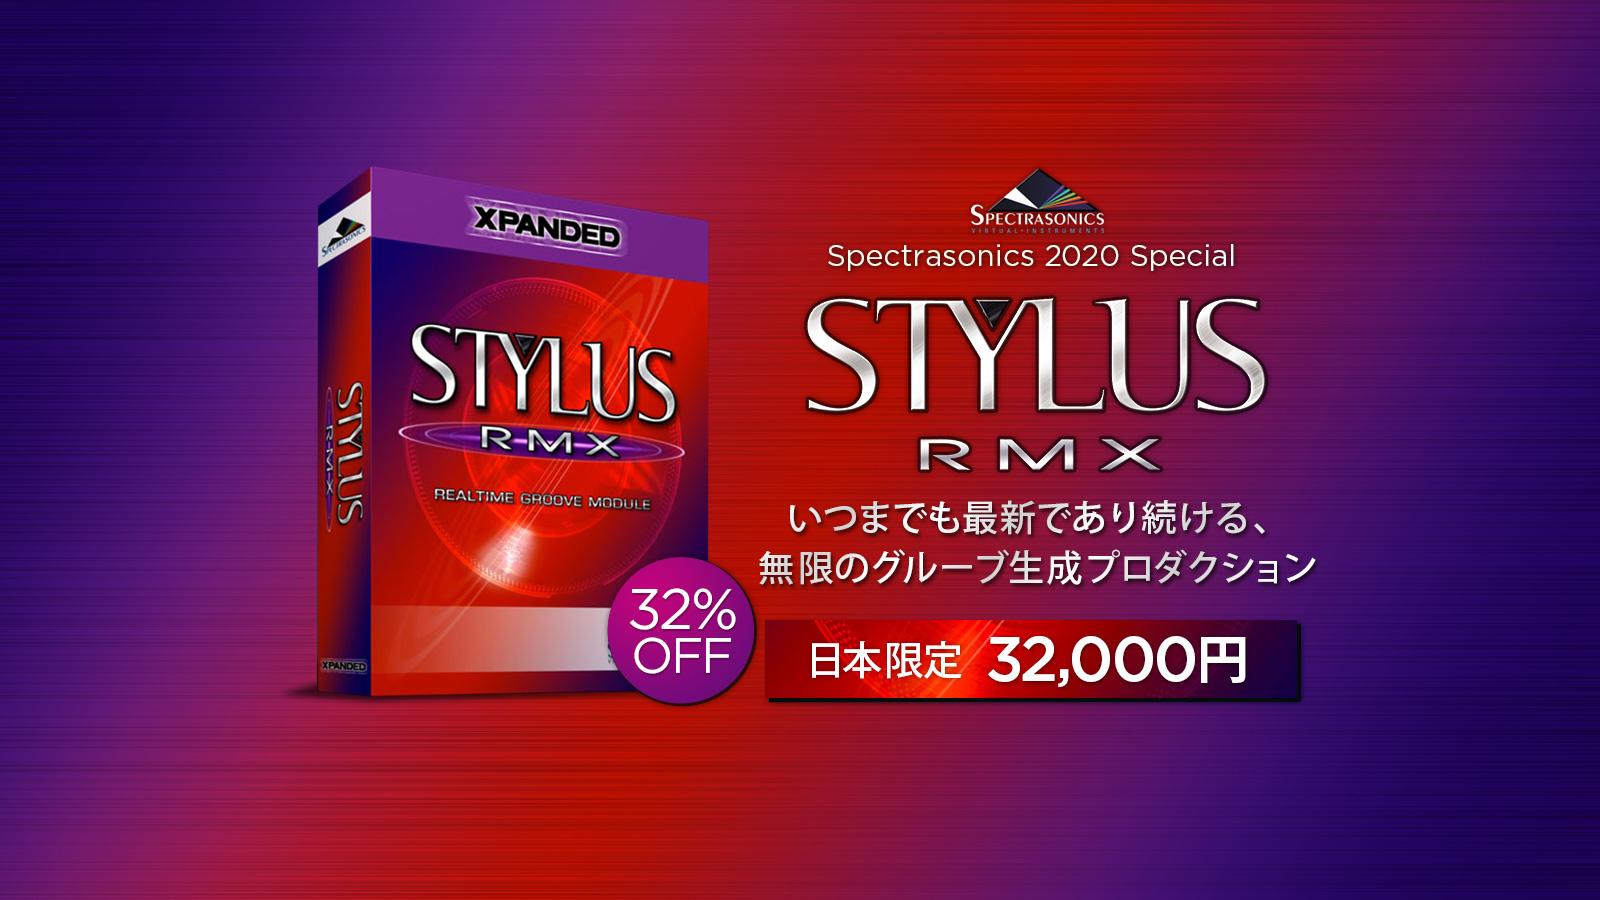 【32%OFF】Spectrasonics Stylus RMX Xpandedが日本限定セール中!